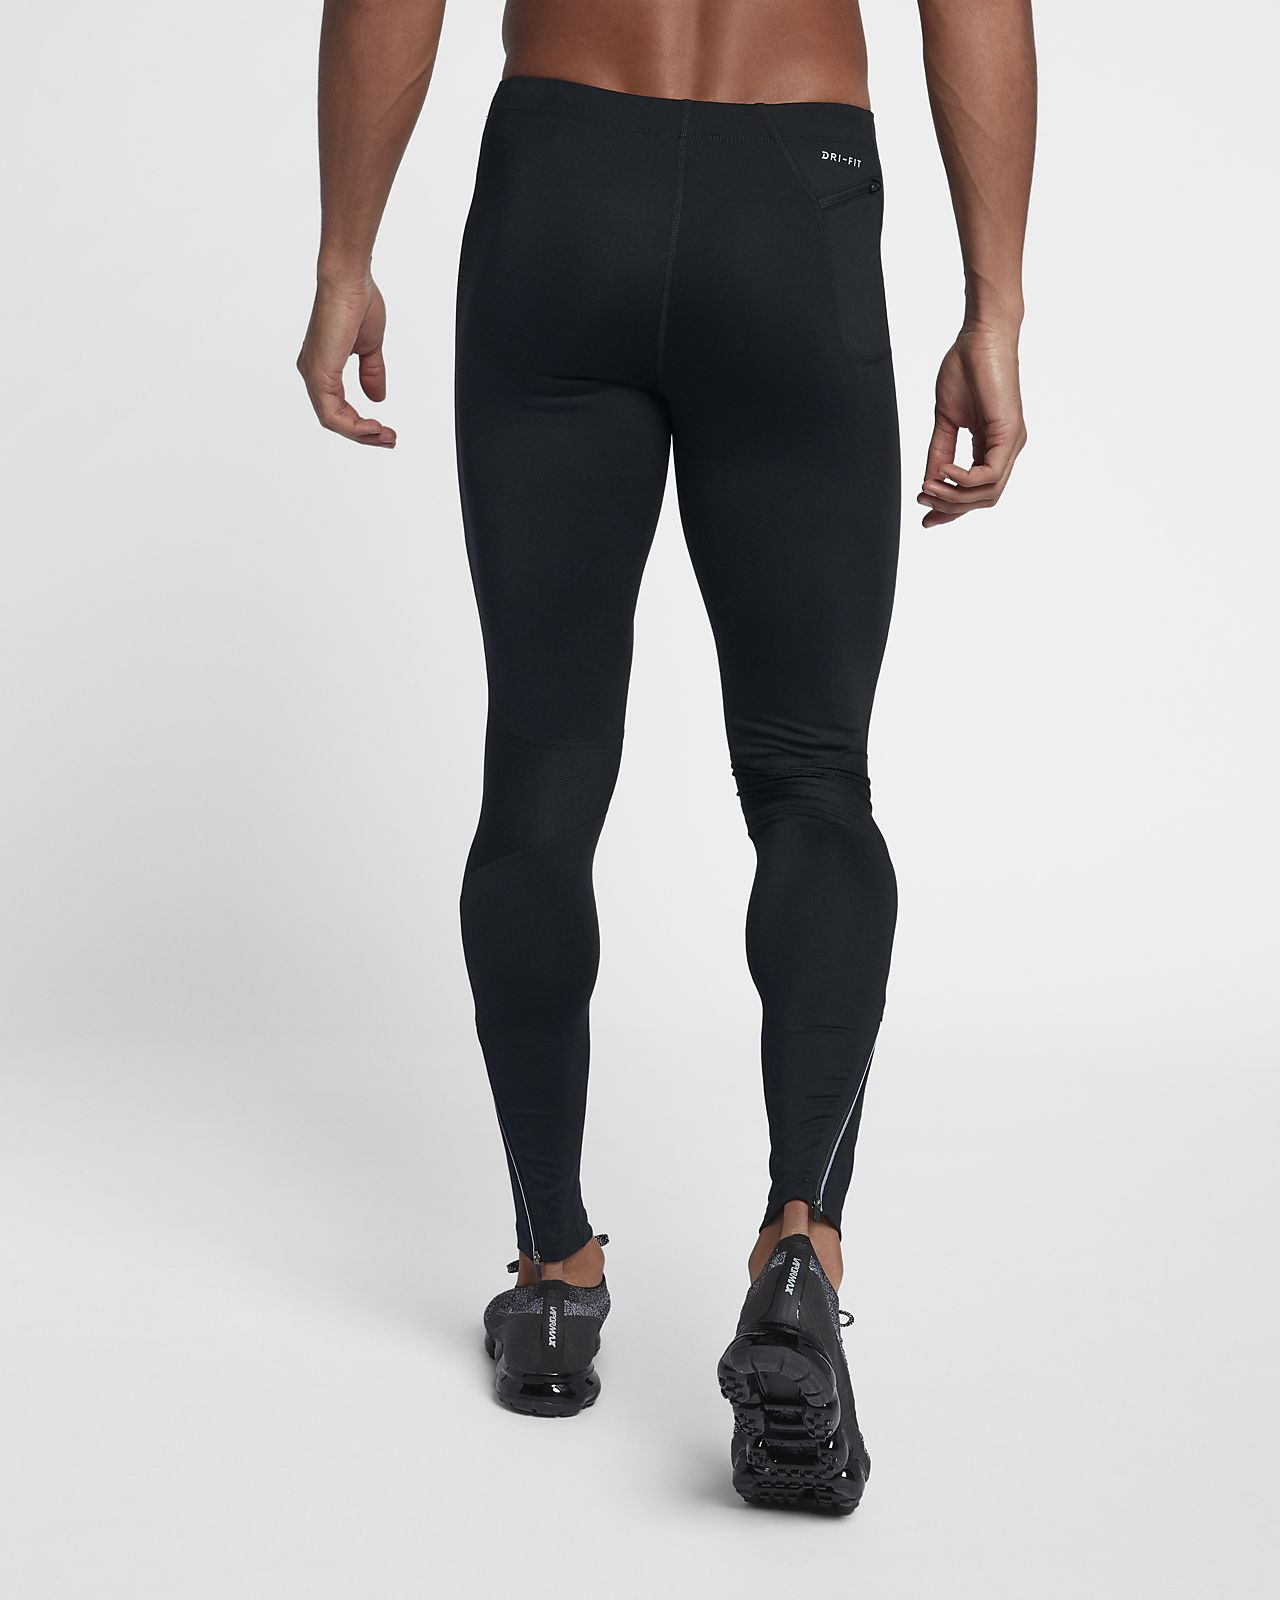 55faee043c4b Ανδρικό κολάν για τρέξιμο Nike Run 72 cm. Nike.com GR